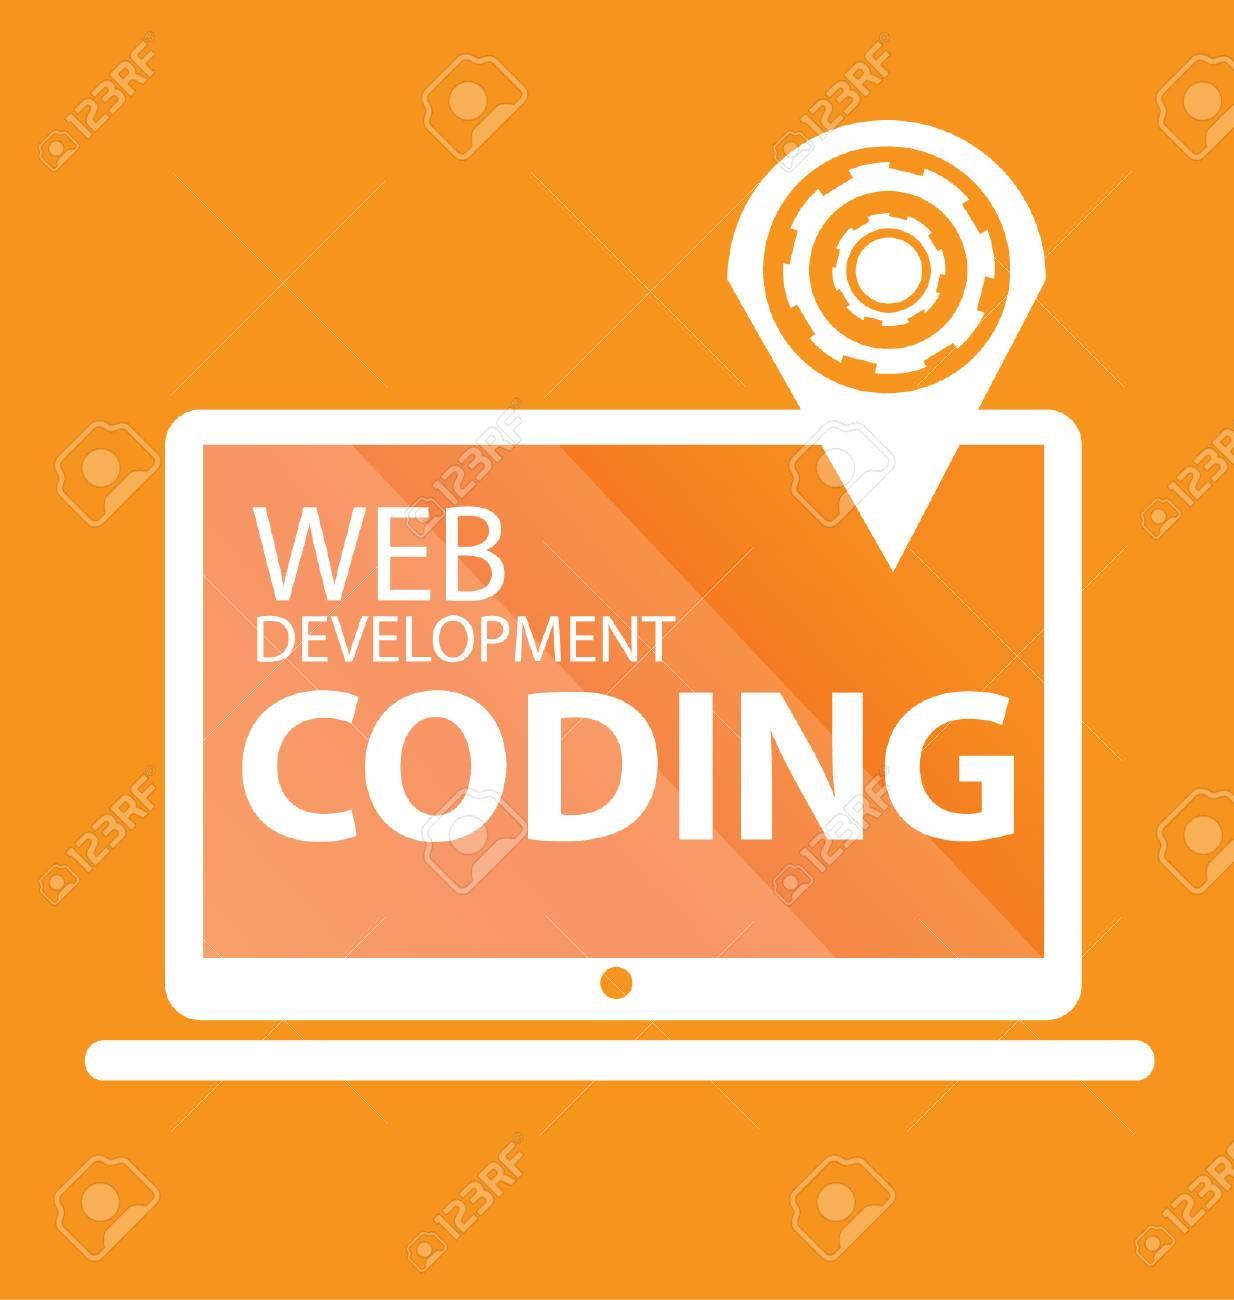 Web Development concept Stock Vector - 25529223